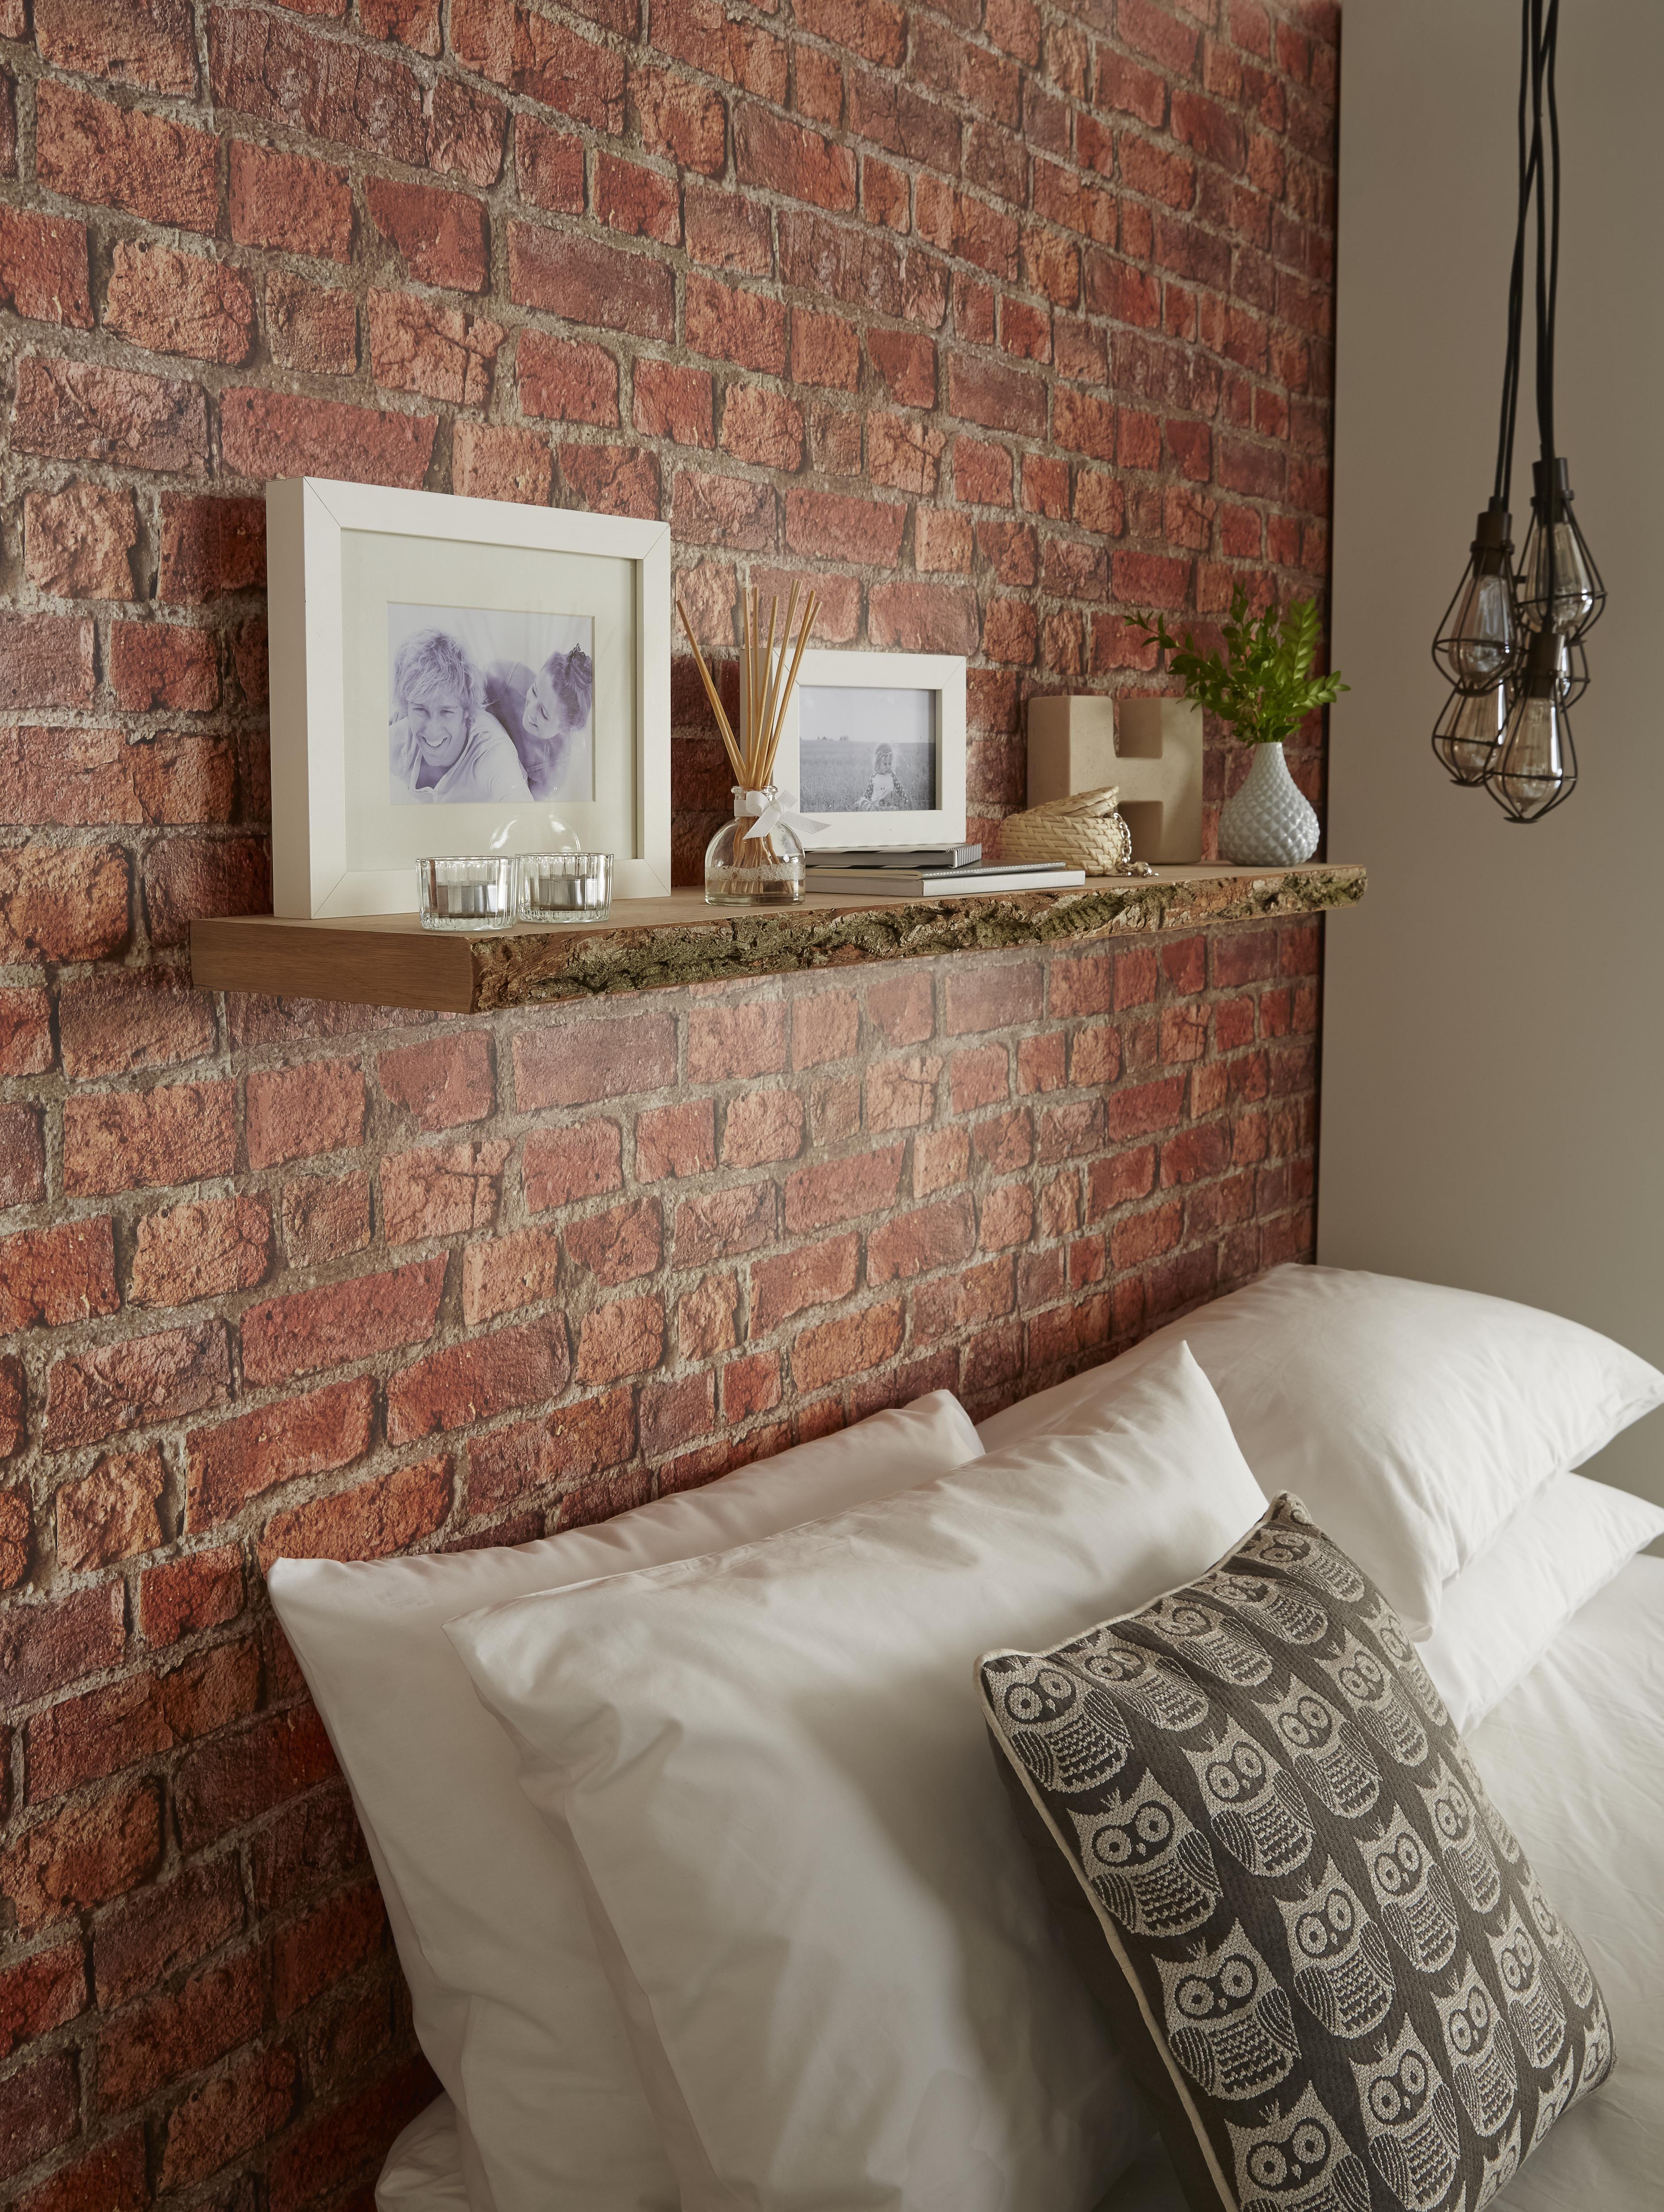 How To Put Up A Shelf?